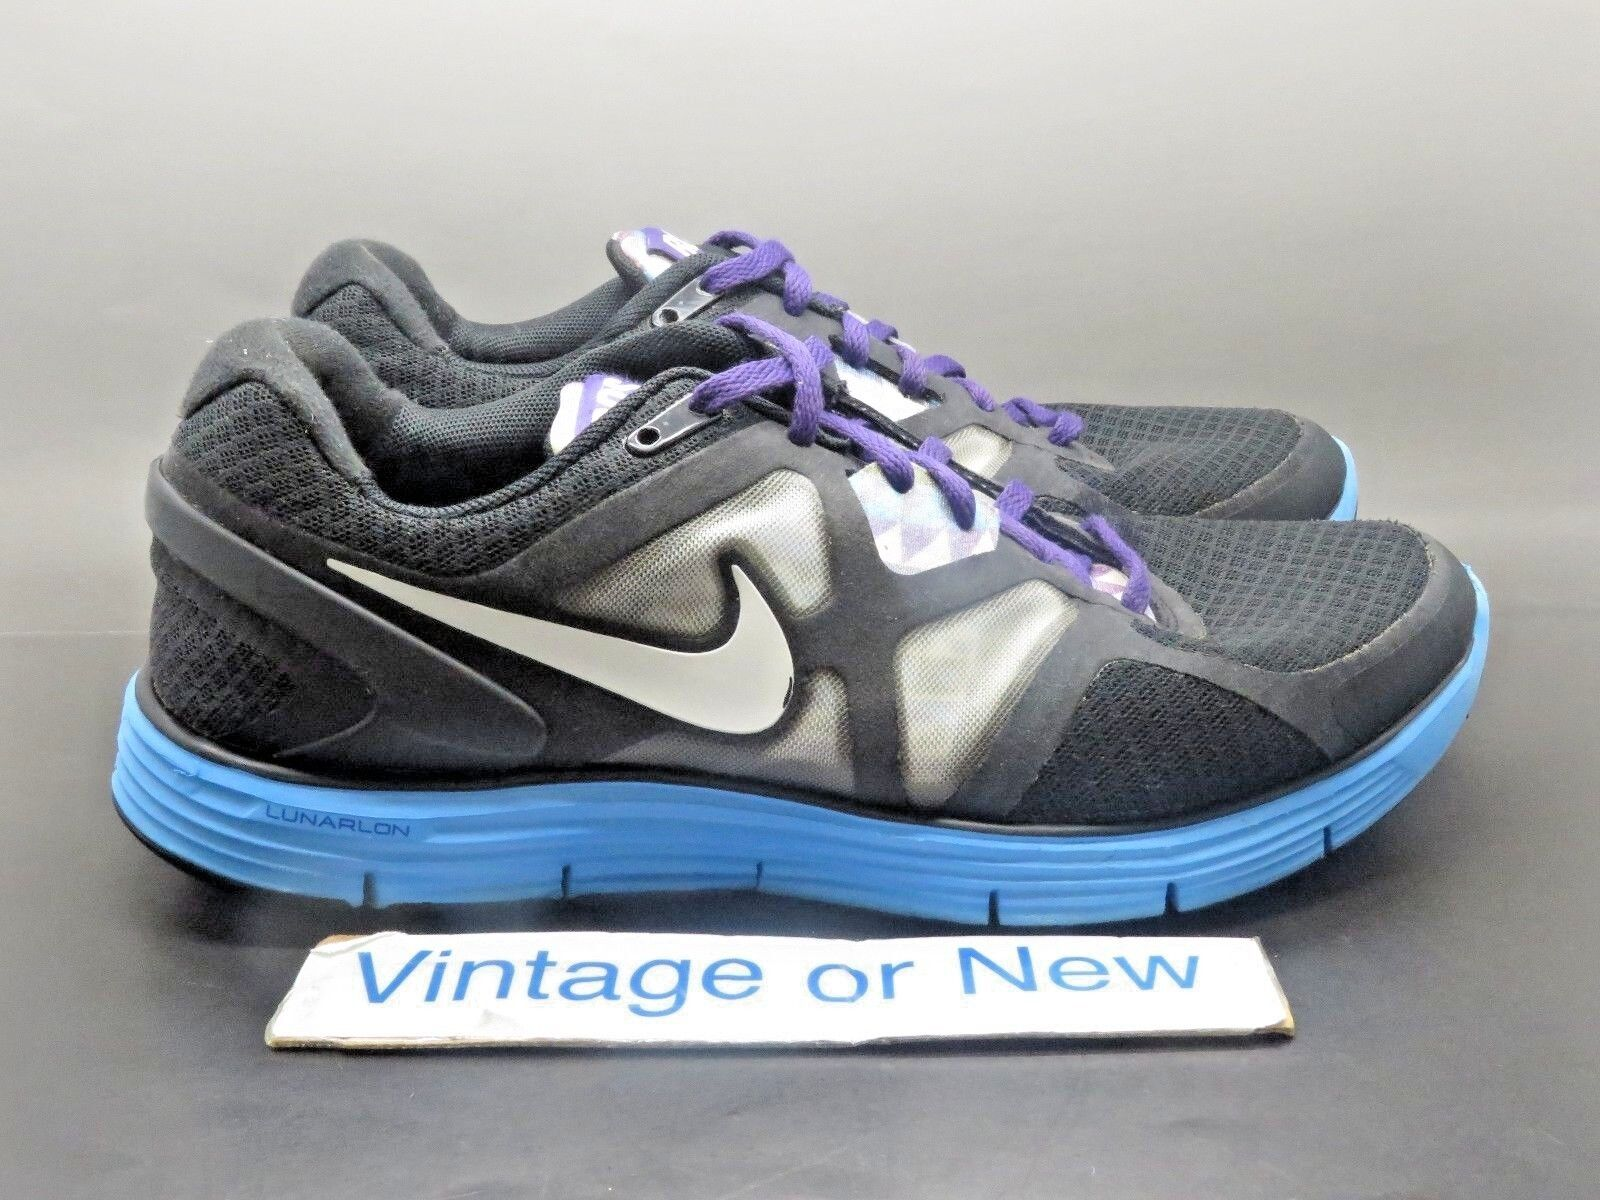 Nike de Lunarglide 3 ciudad de serie Maratón de Nike Boston 2018 482930-018 Correr deae89